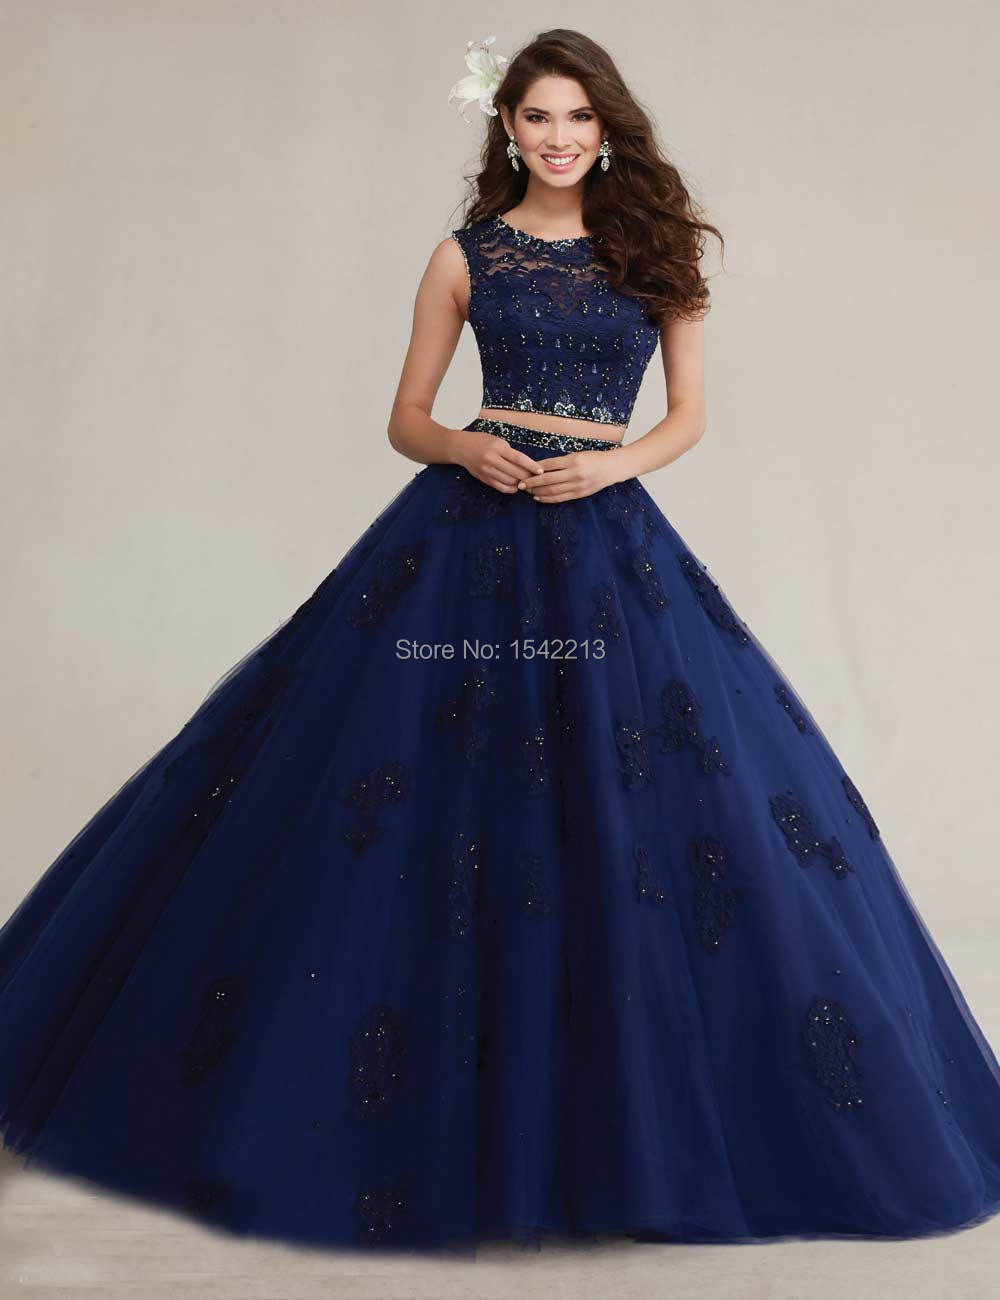 Aliexpress.com : Buy Navy Blue Pink Lace Beaded Quinceaneran Dress ...